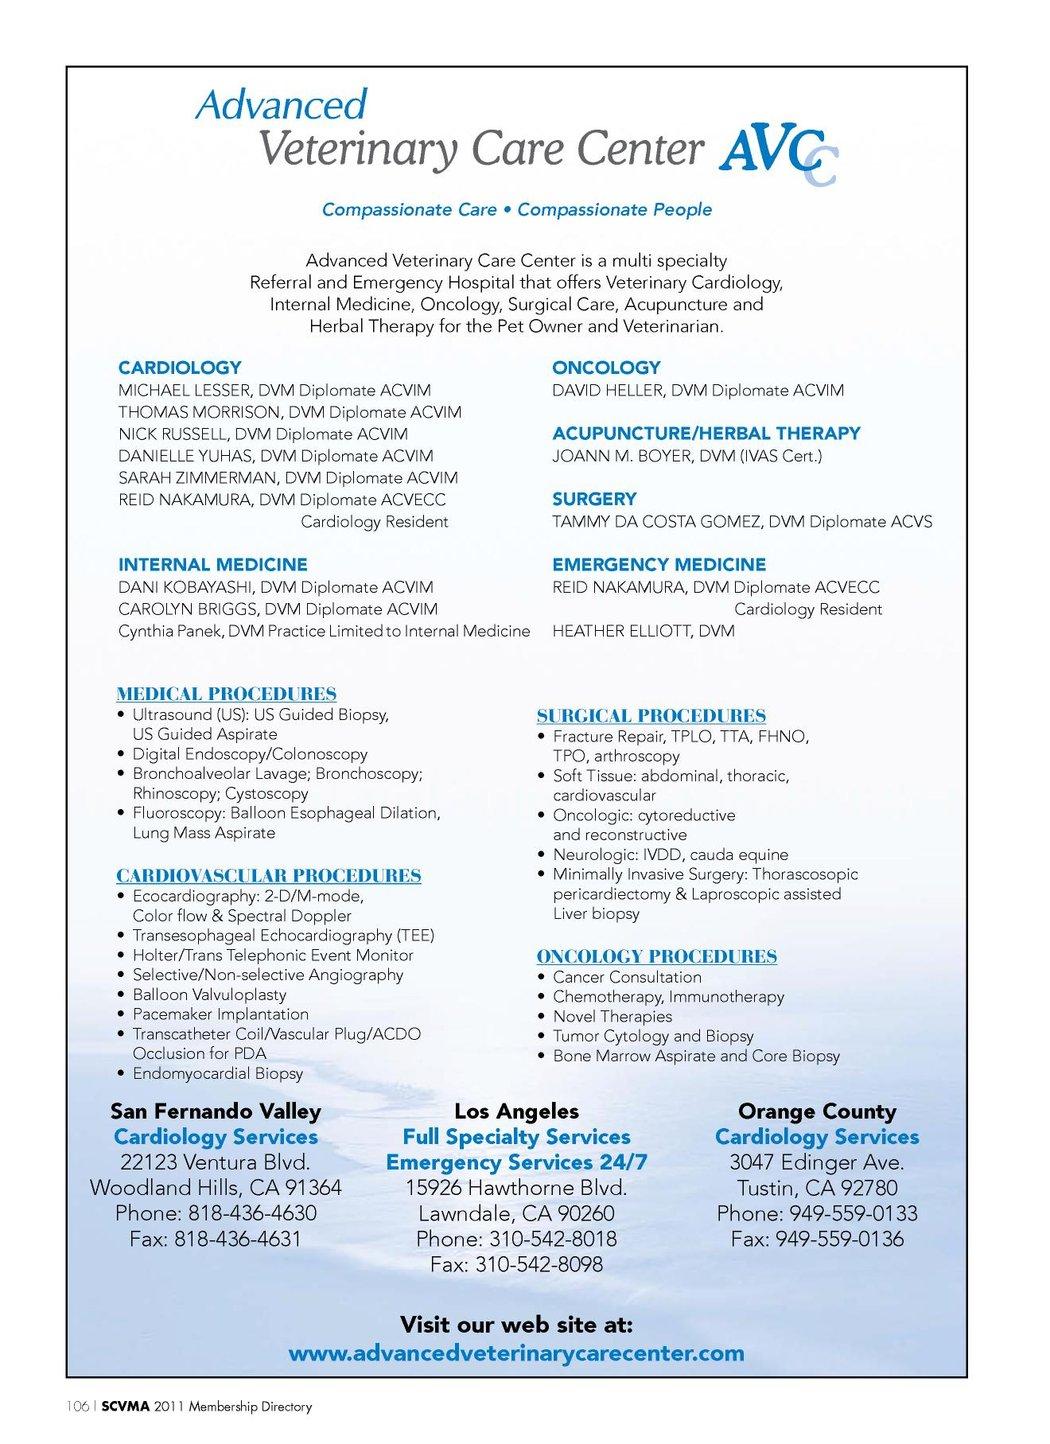 Membership Directory 2011-2012